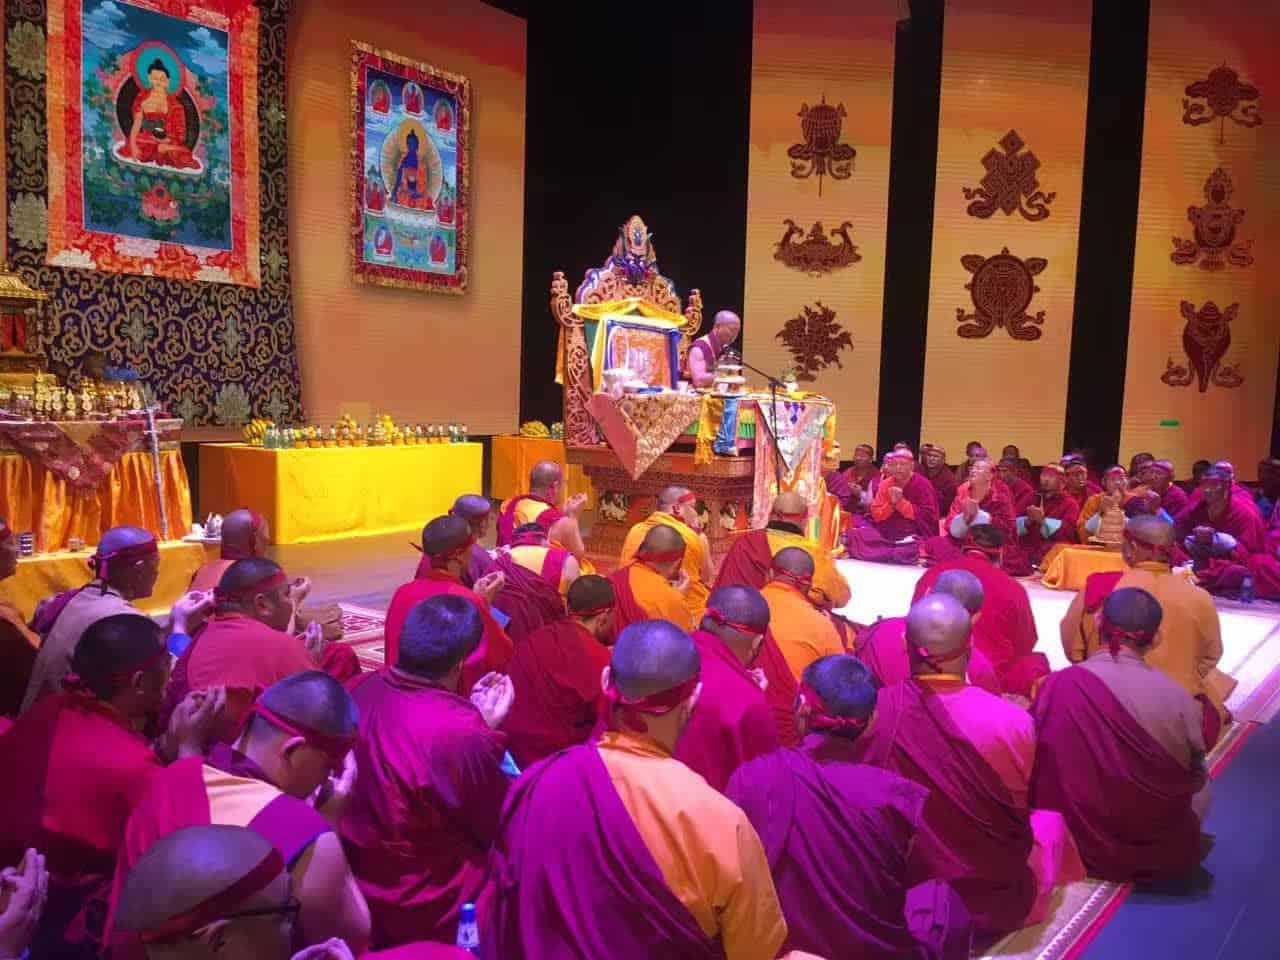 gosok-rinpoche-mongolia-2016-7a8b34eb2bf93d3de81694e83b2208b